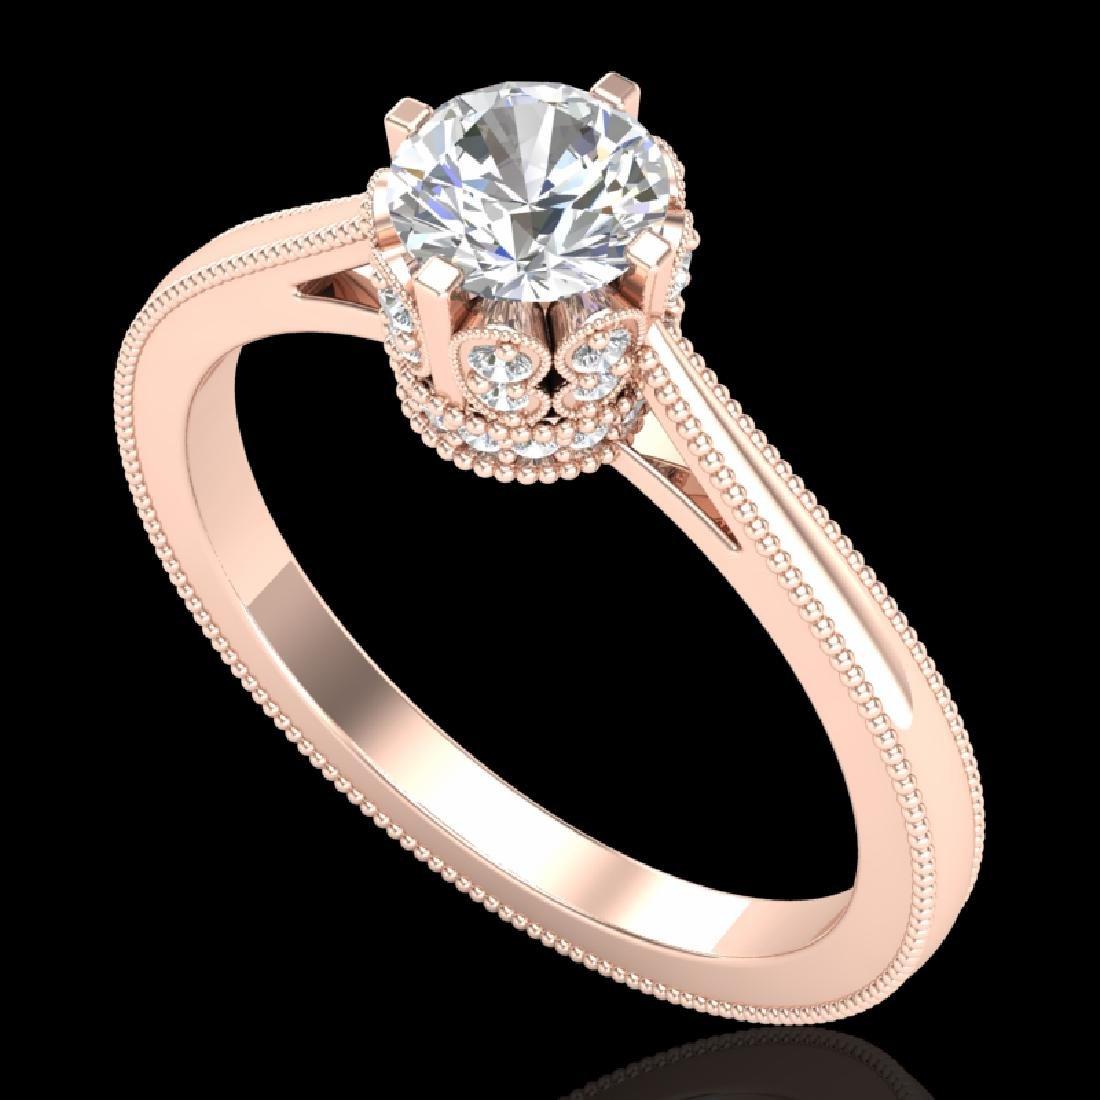 0.81 CTW VS/SI Diamond Solitaire Art Deco Ring 18K Rose